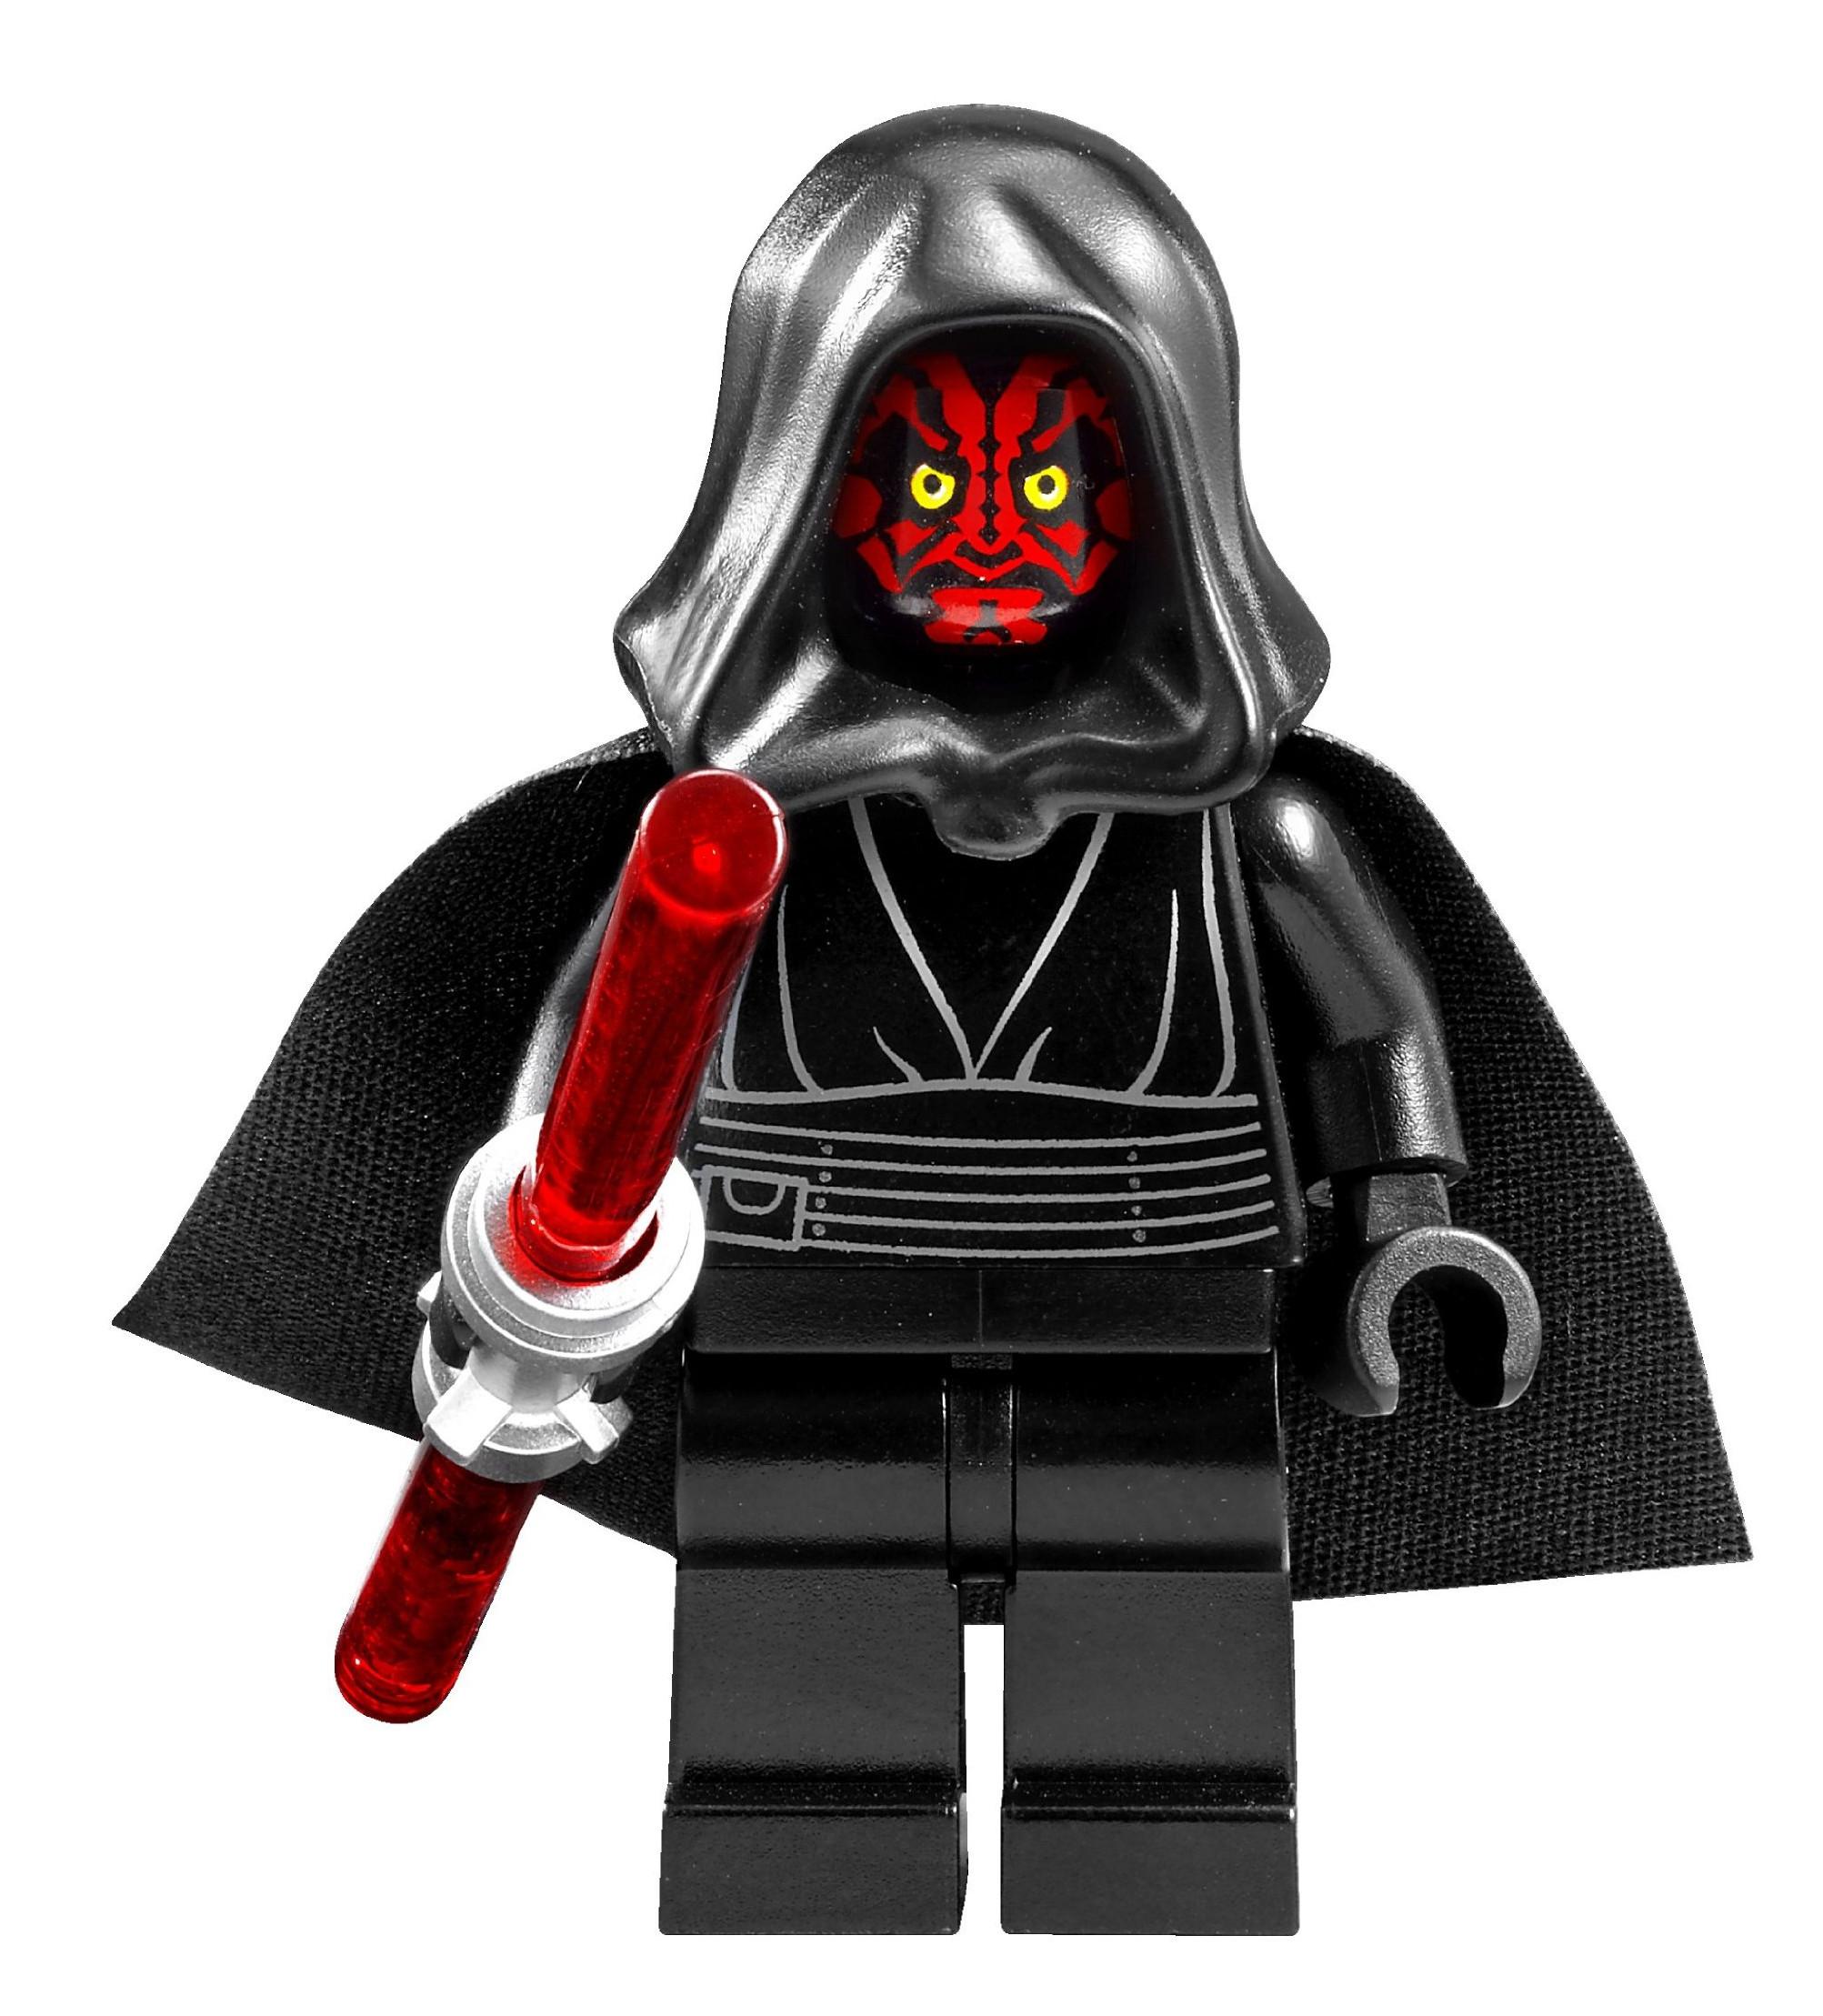 LEGO Darth Maul Wallpaper – WallpaperSafari. LEGO Darth Maul Wallpaper  WallpaperSafari